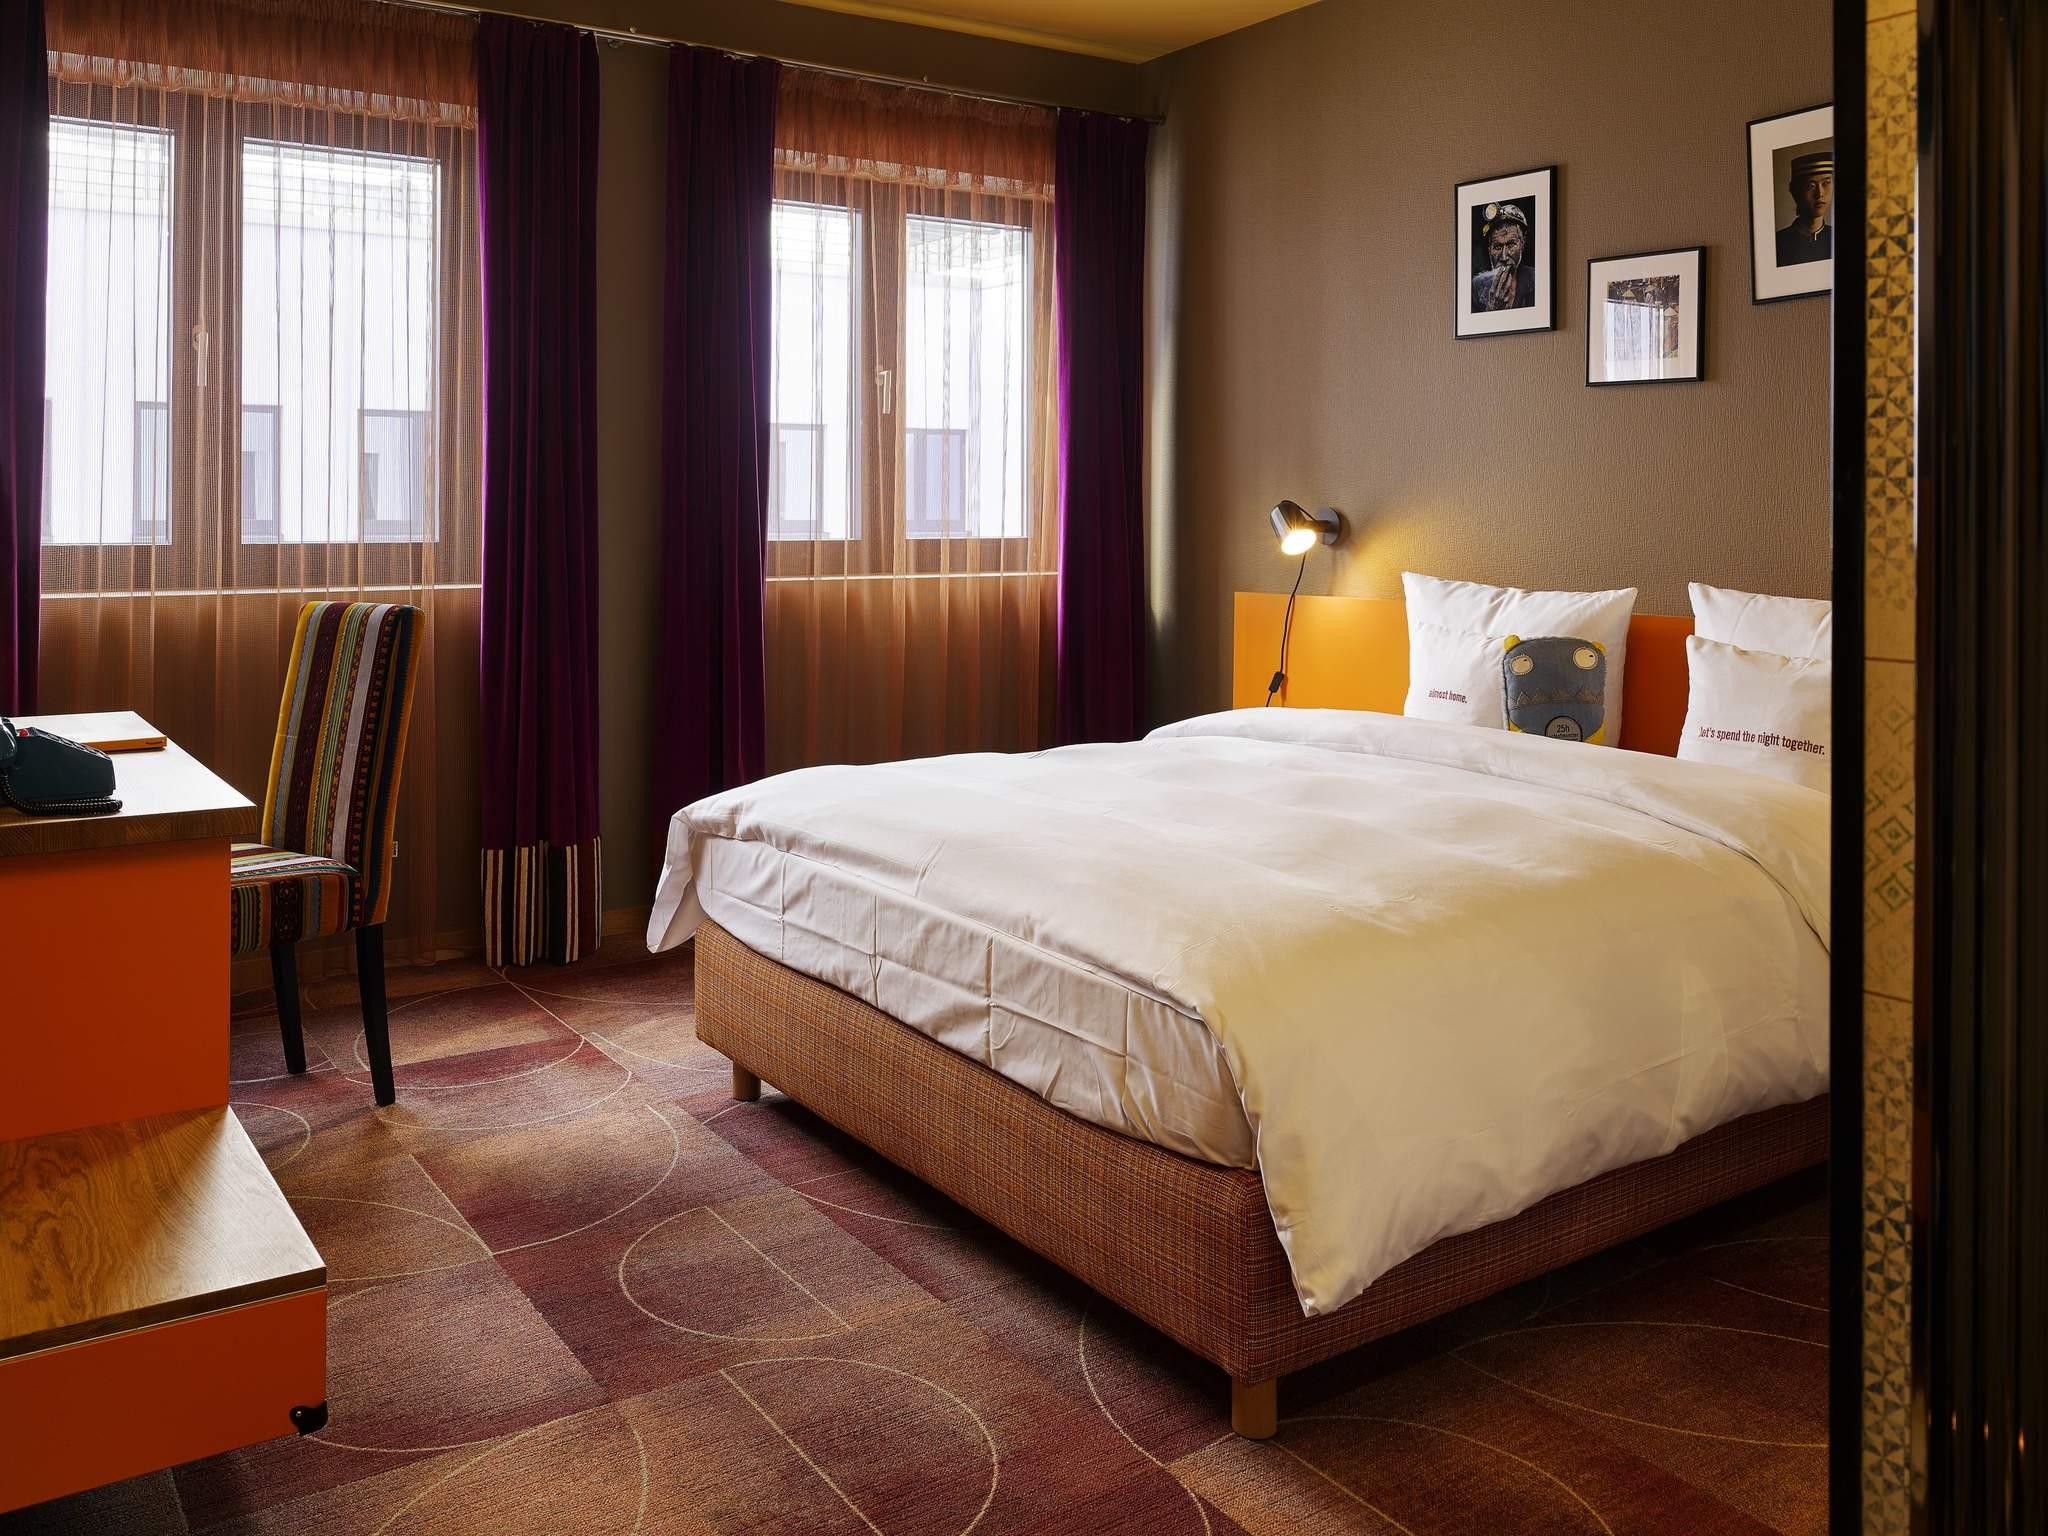 hotel in frankfurt 25hours hotel the trip. Black Bedroom Furniture Sets. Home Design Ideas